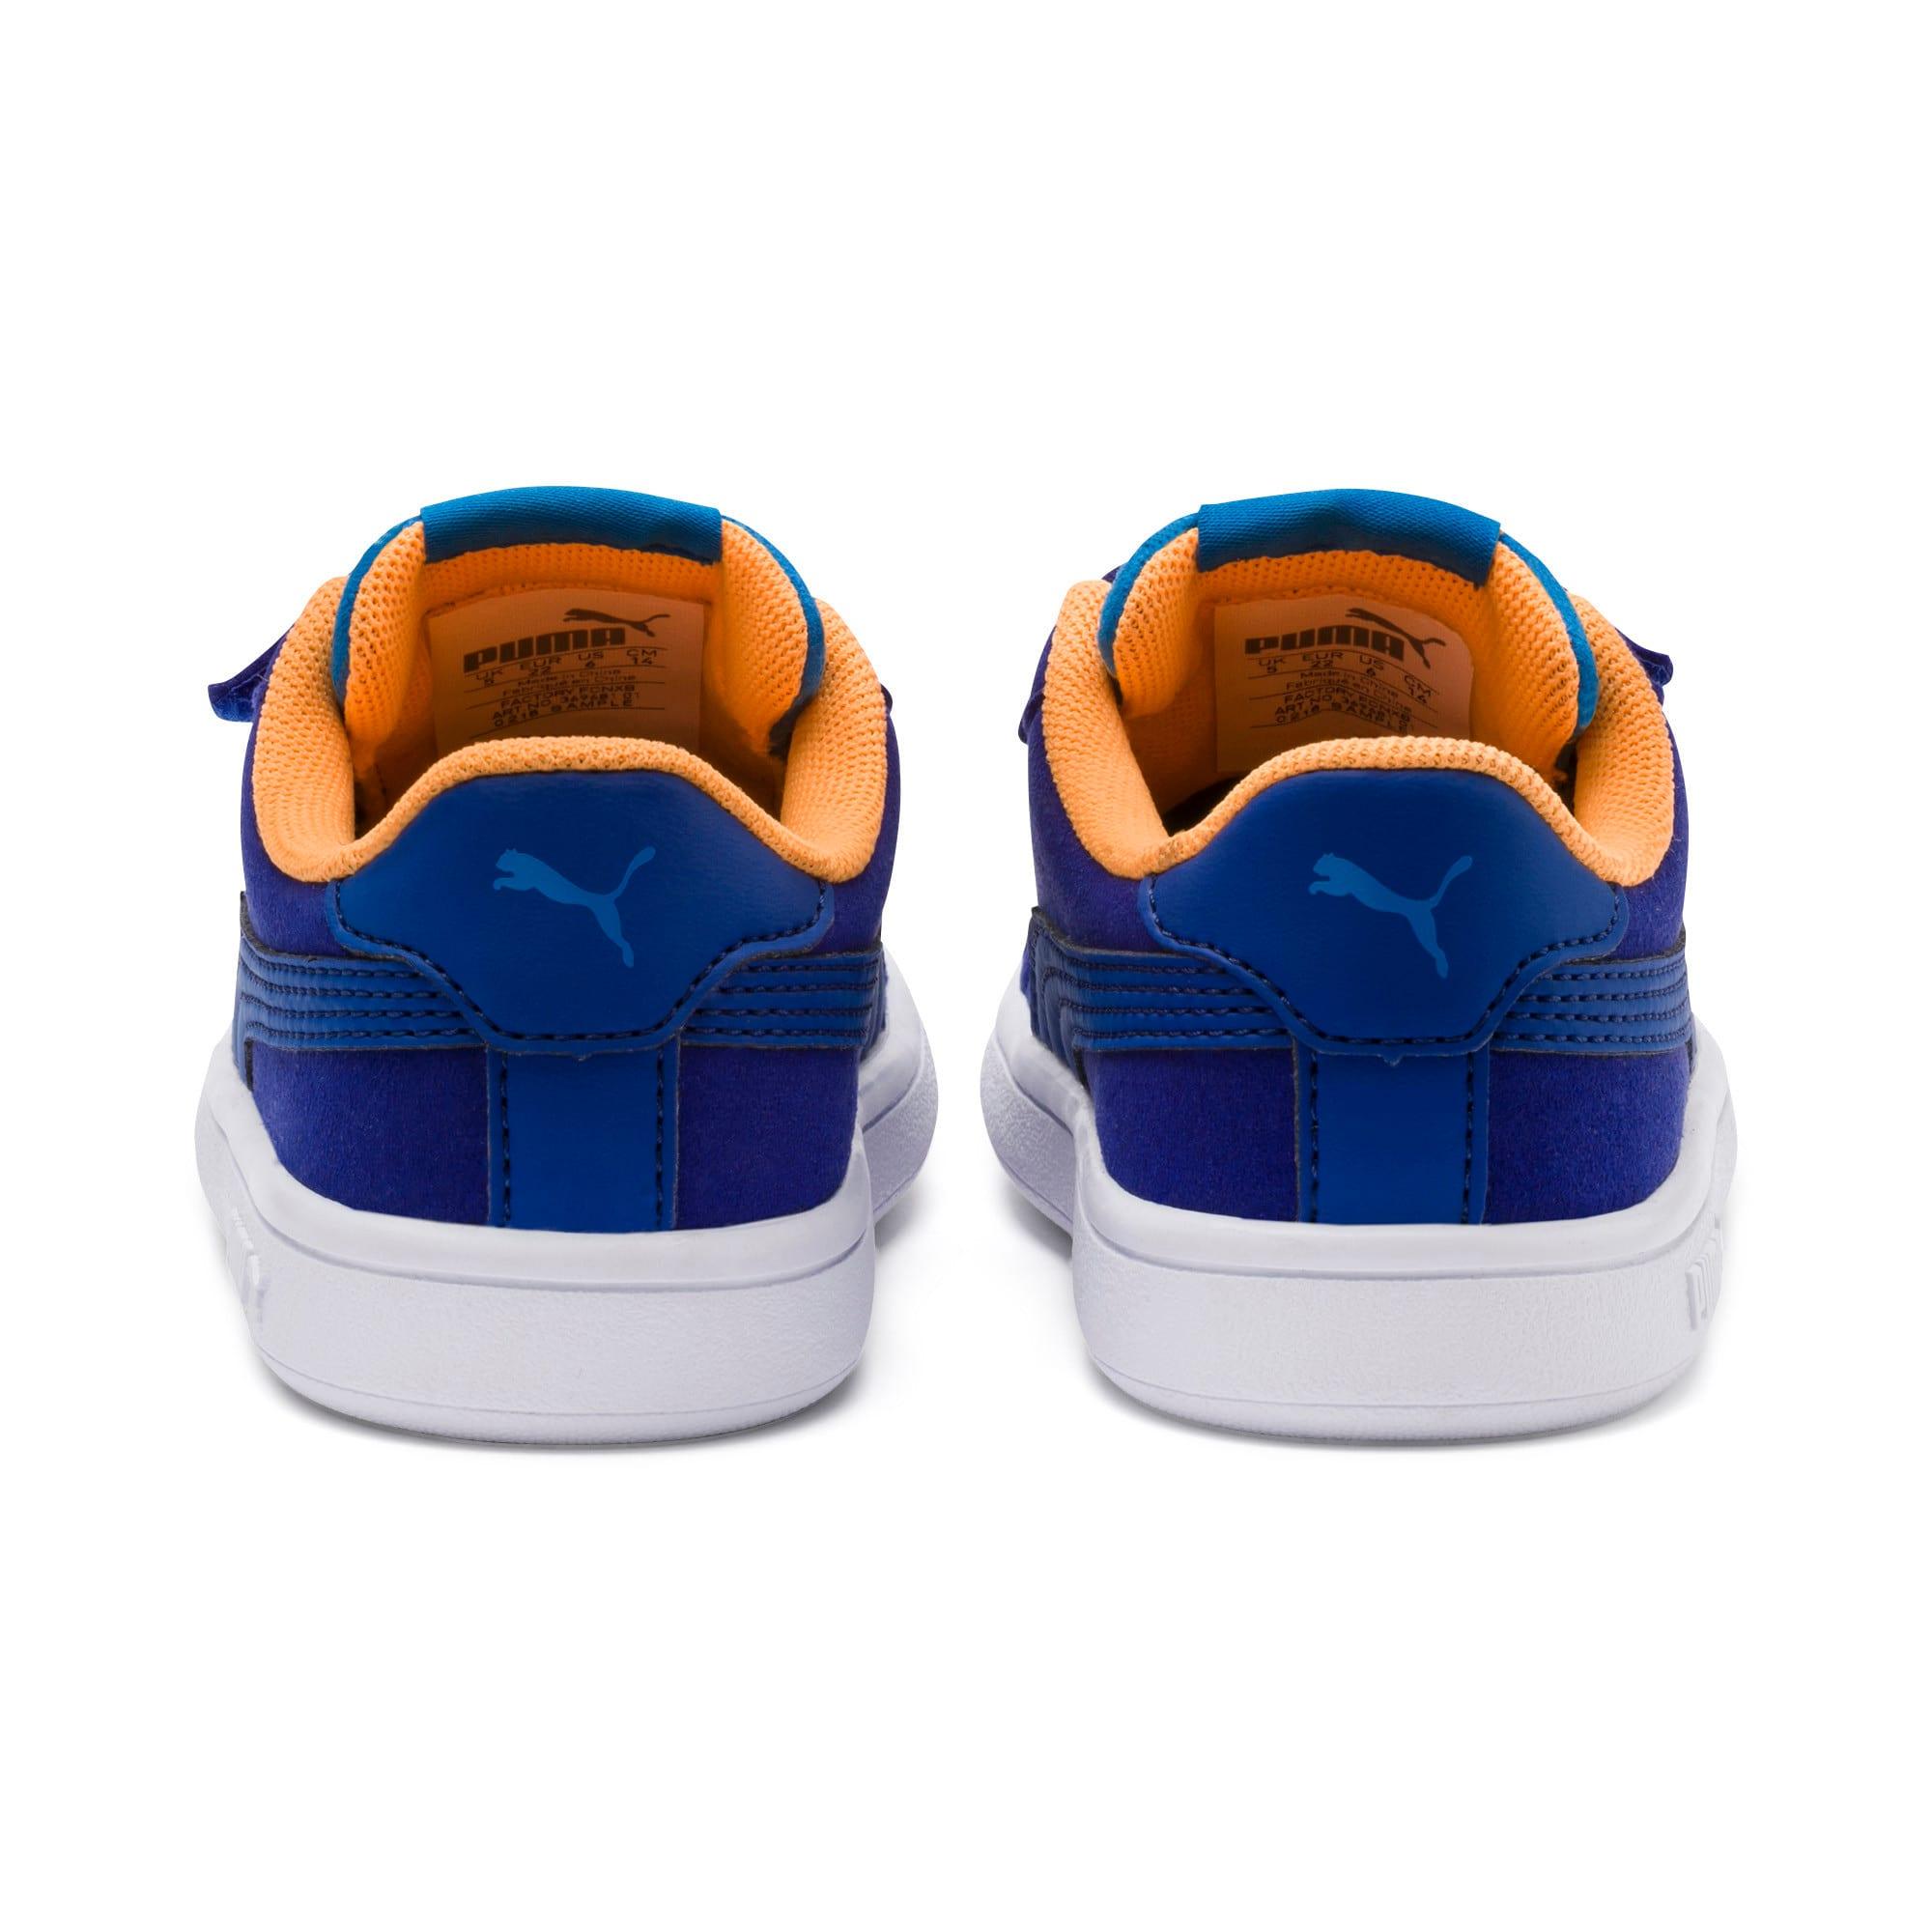 Thumbnail 3 of PUMA Smash v2 Monster Little Kids' Shoes, Sf Th Wb-I Bunting-Ornge-Wht, medium